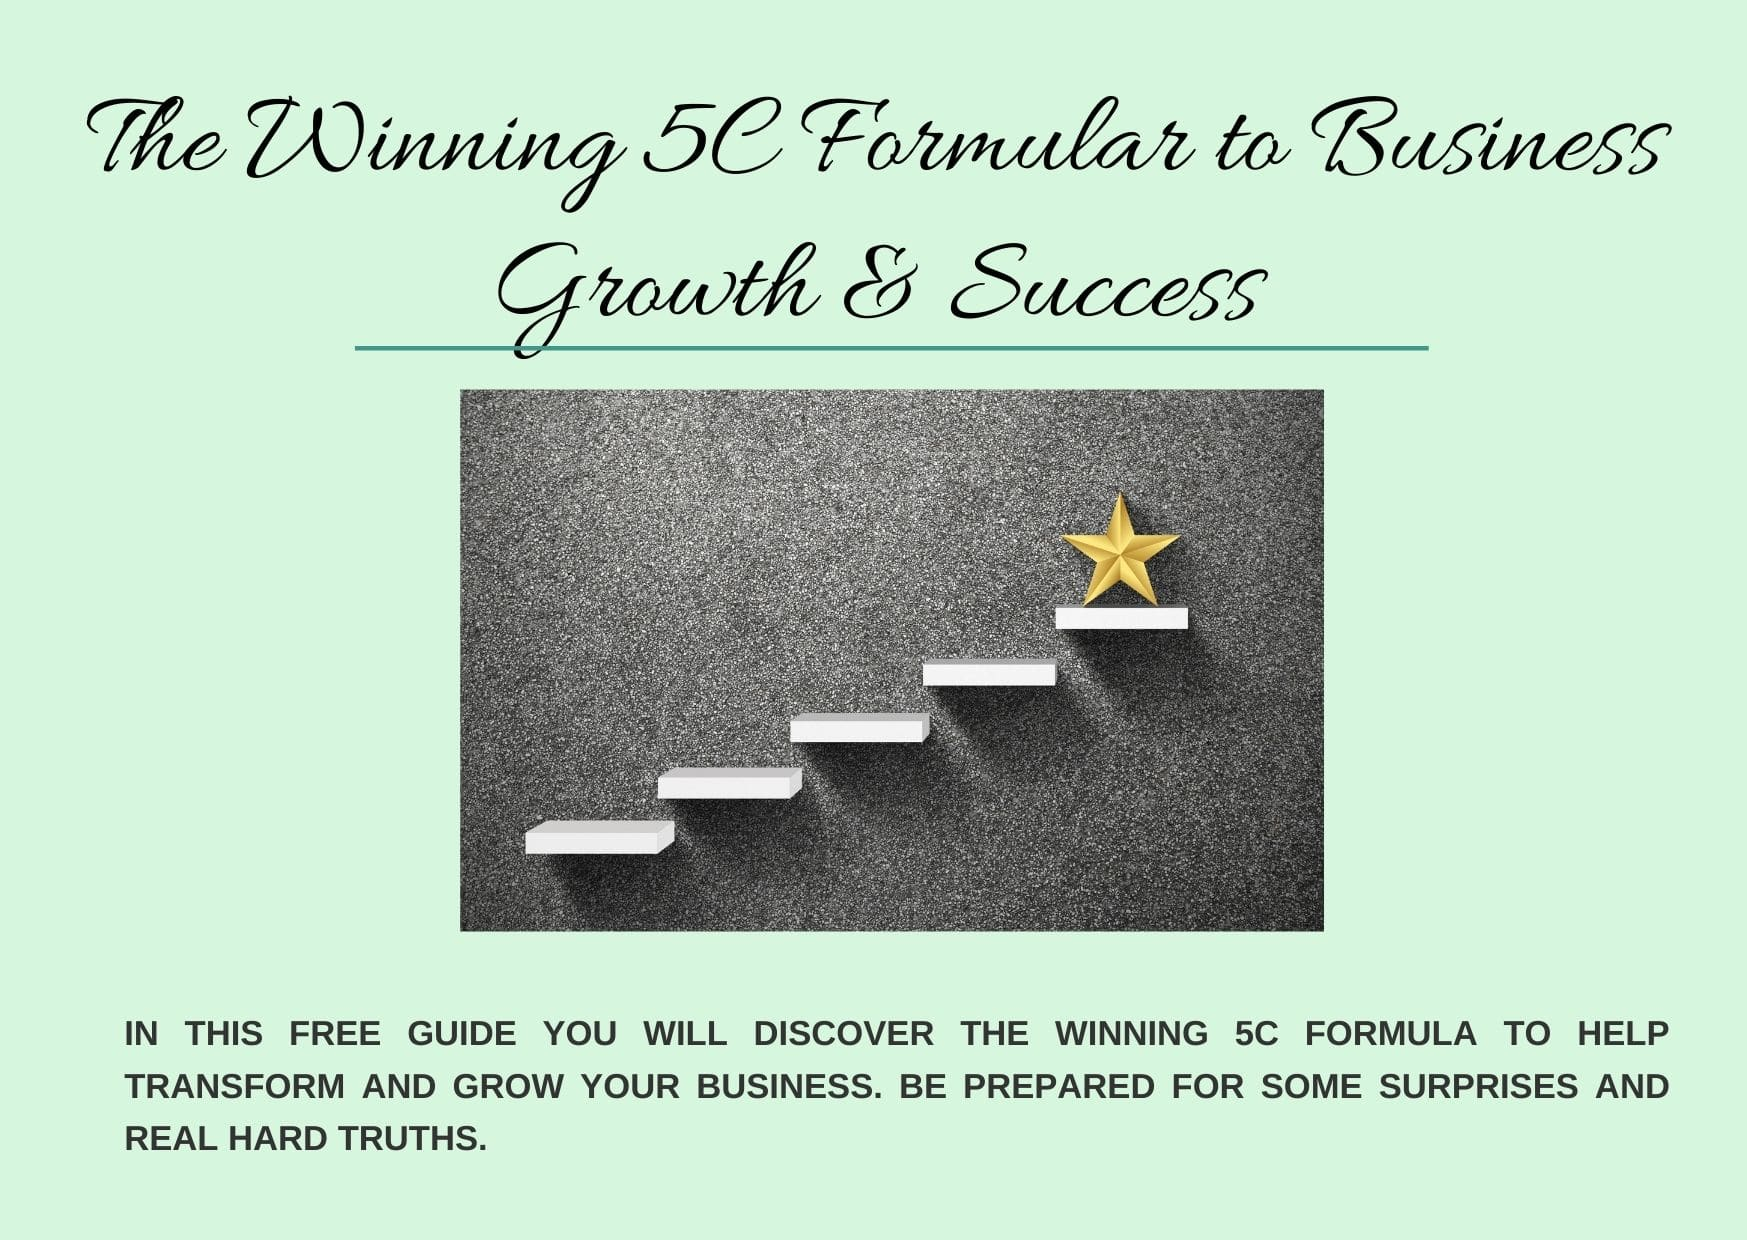 5C-Formula-Turn-Business-Around-Web-Image